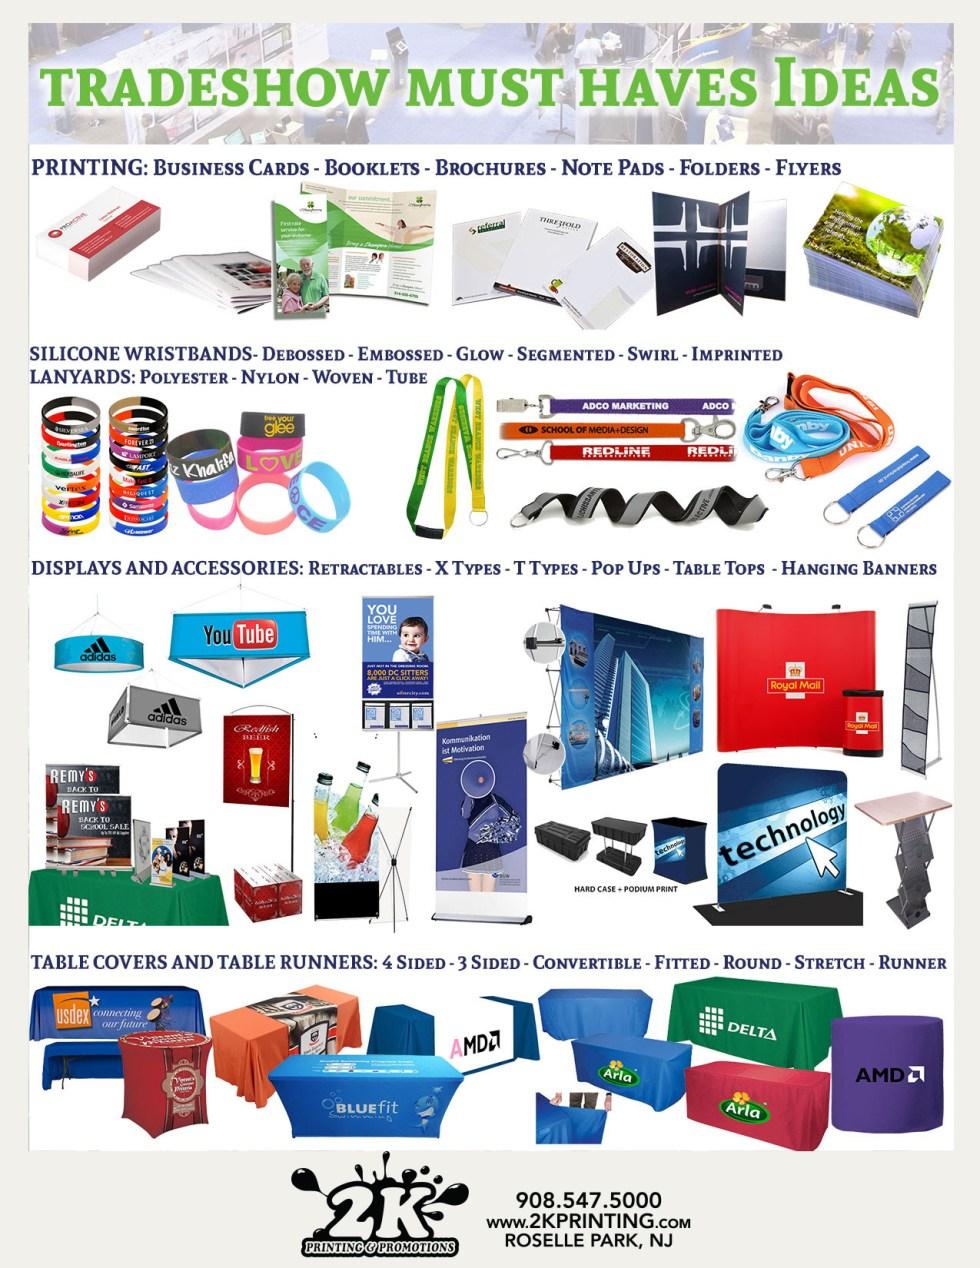 tradeshow promos and marketing materials